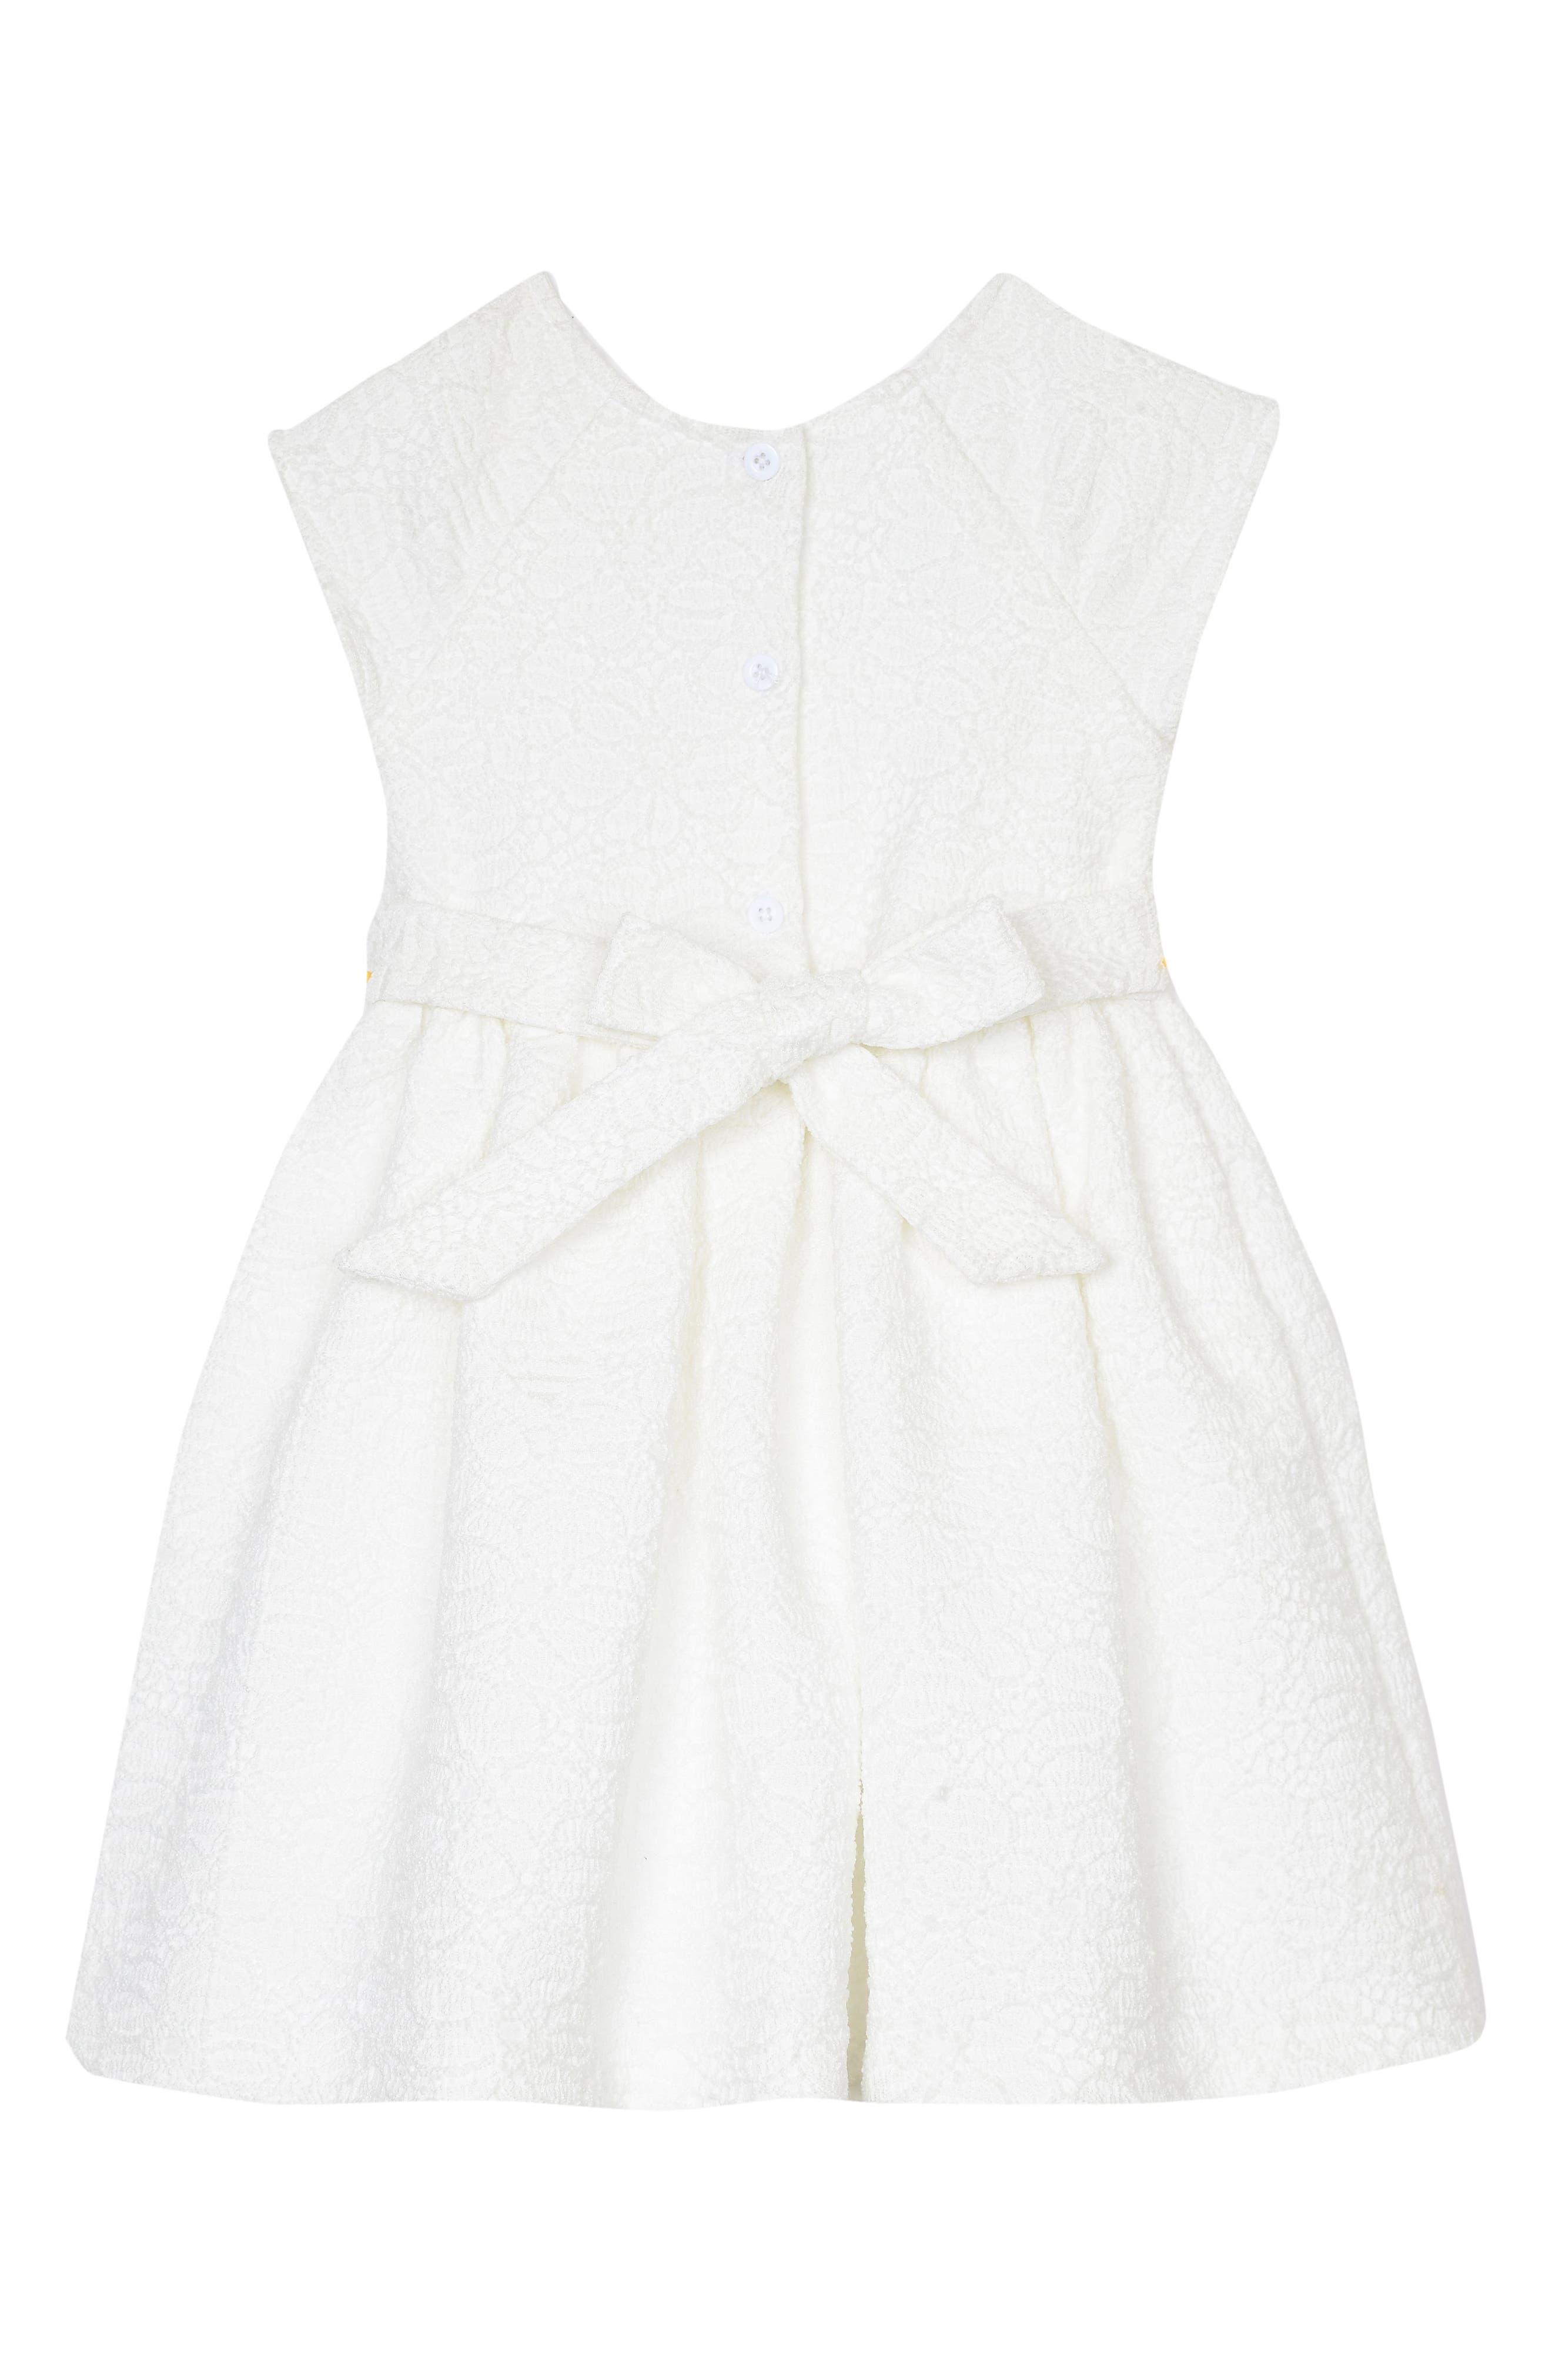 Cherry Blossom Dress,                             Alternate thumbnail 2, color,                             100